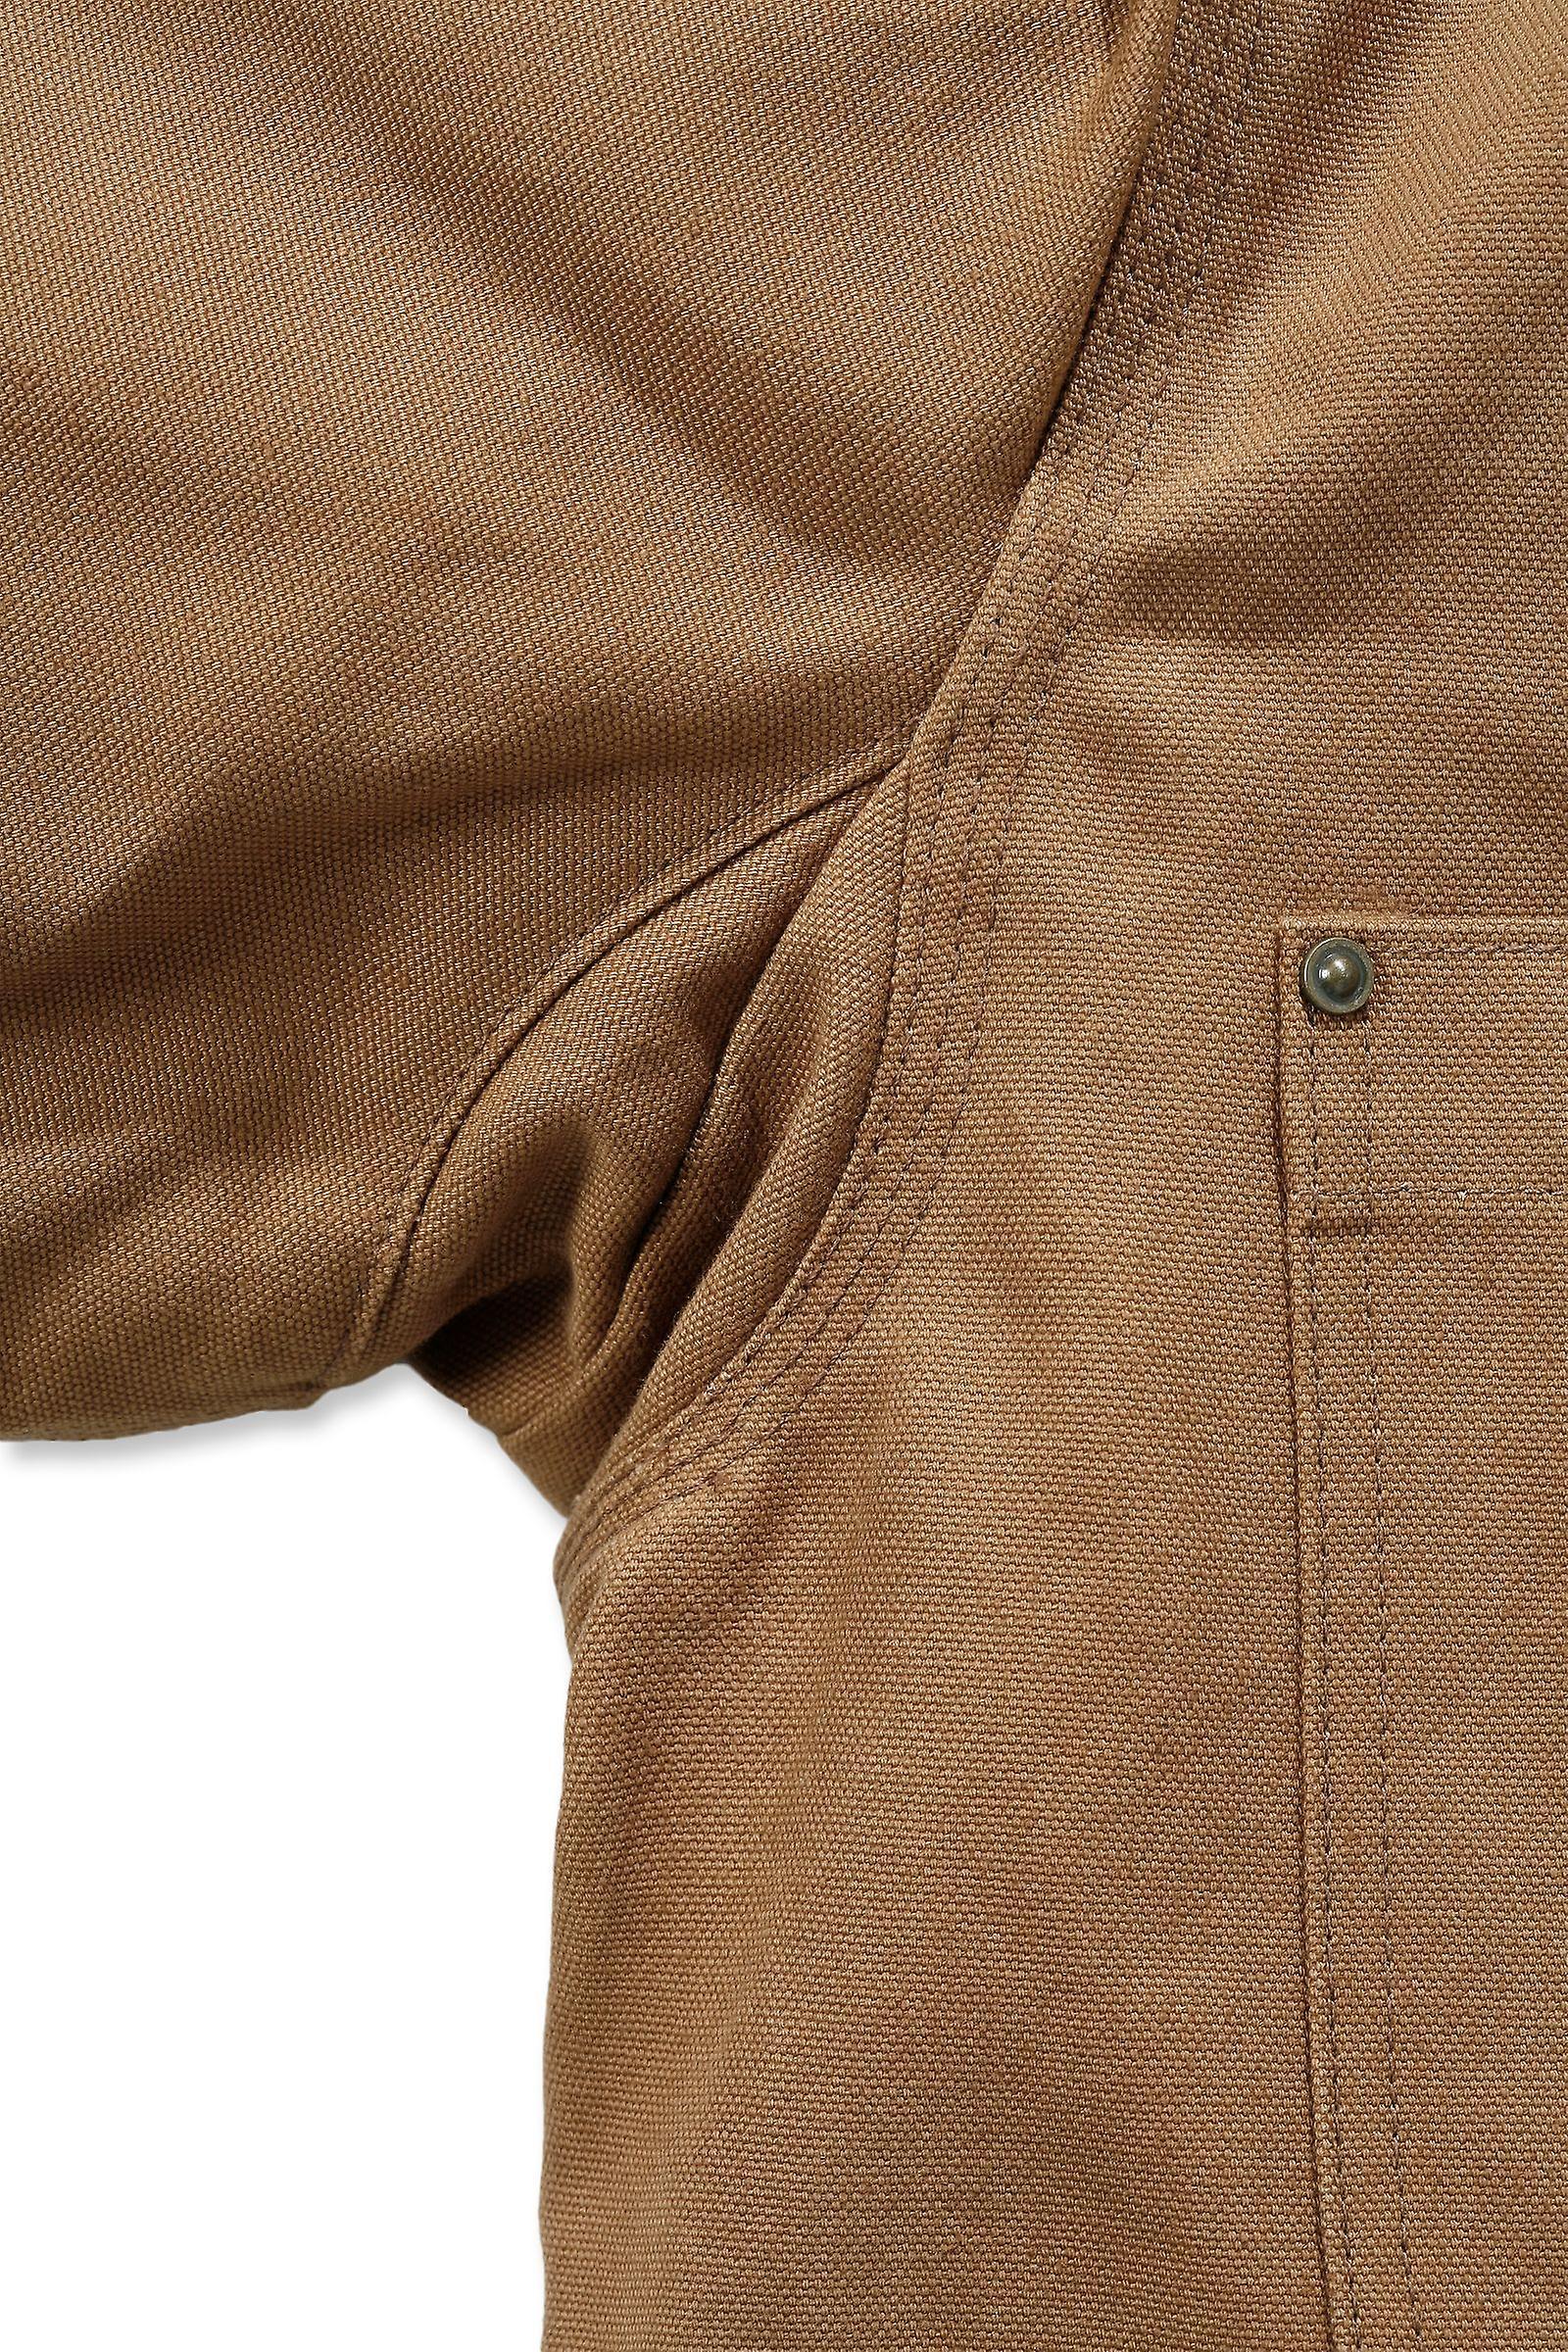 Carhartt jakke fuld sving akkord frakke